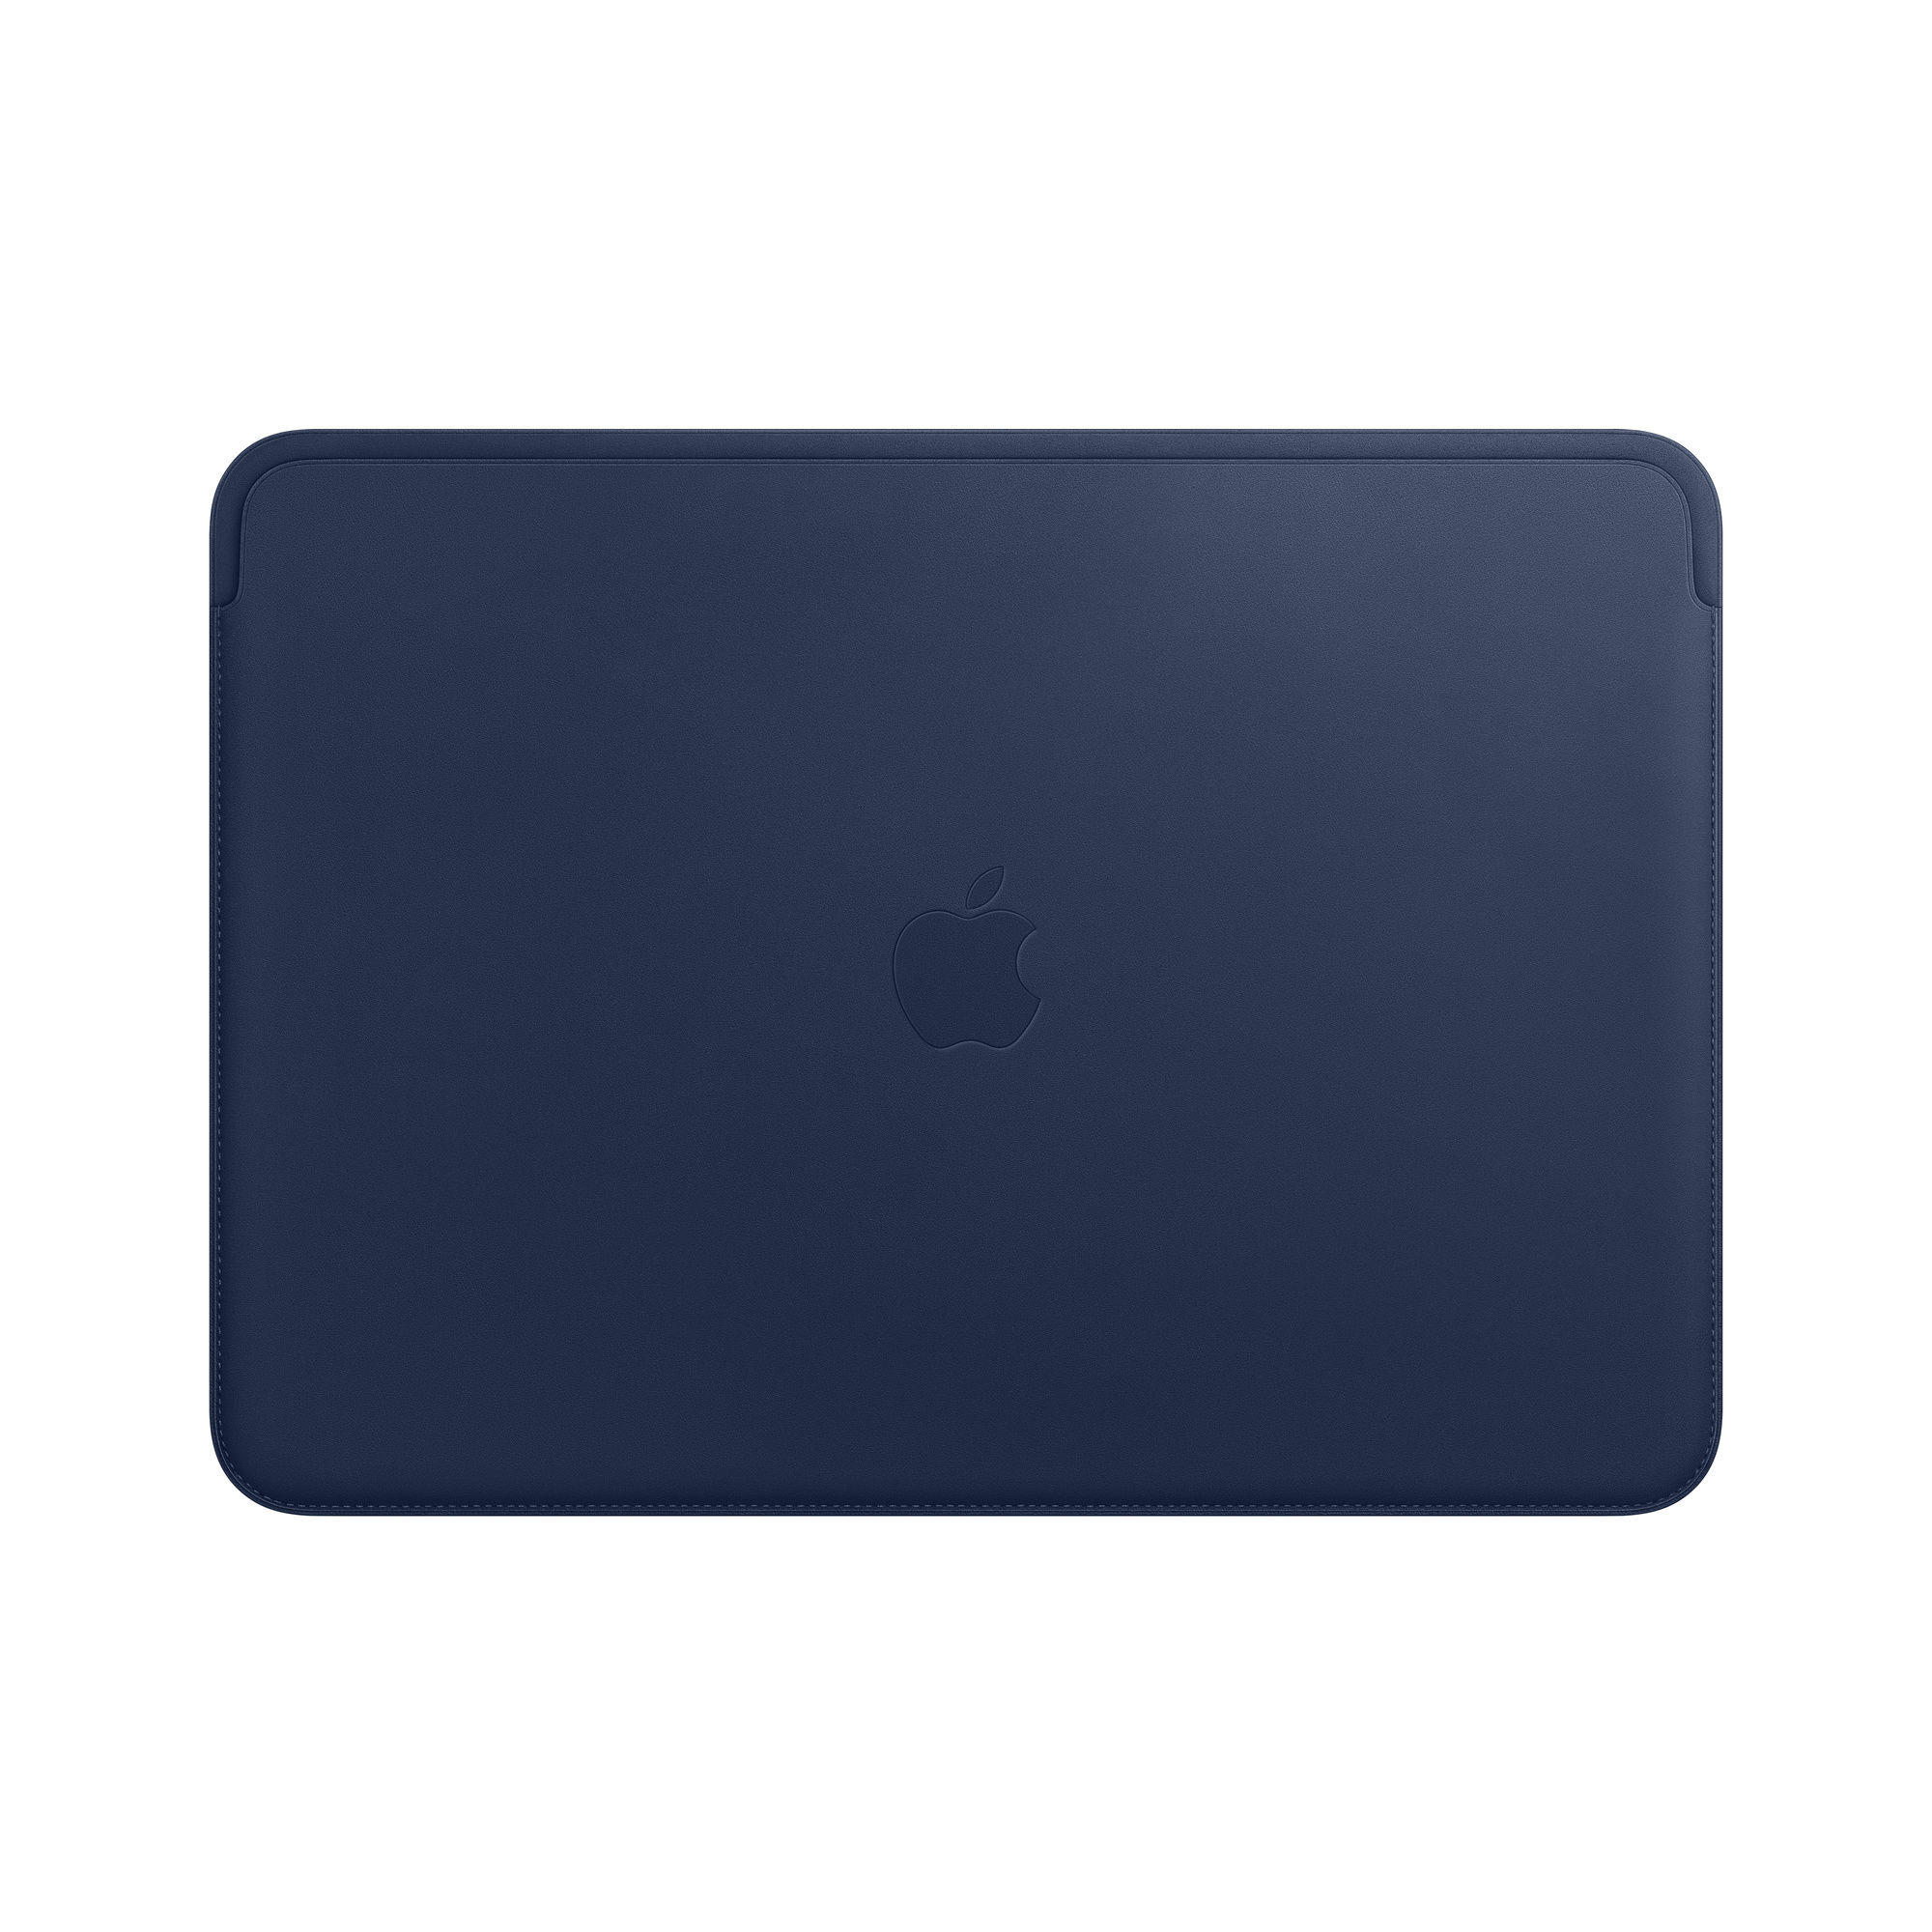 Portable Leather Laptop Bag MacBook Air Pro Retina Case Sleeve Soft Notebook Bag